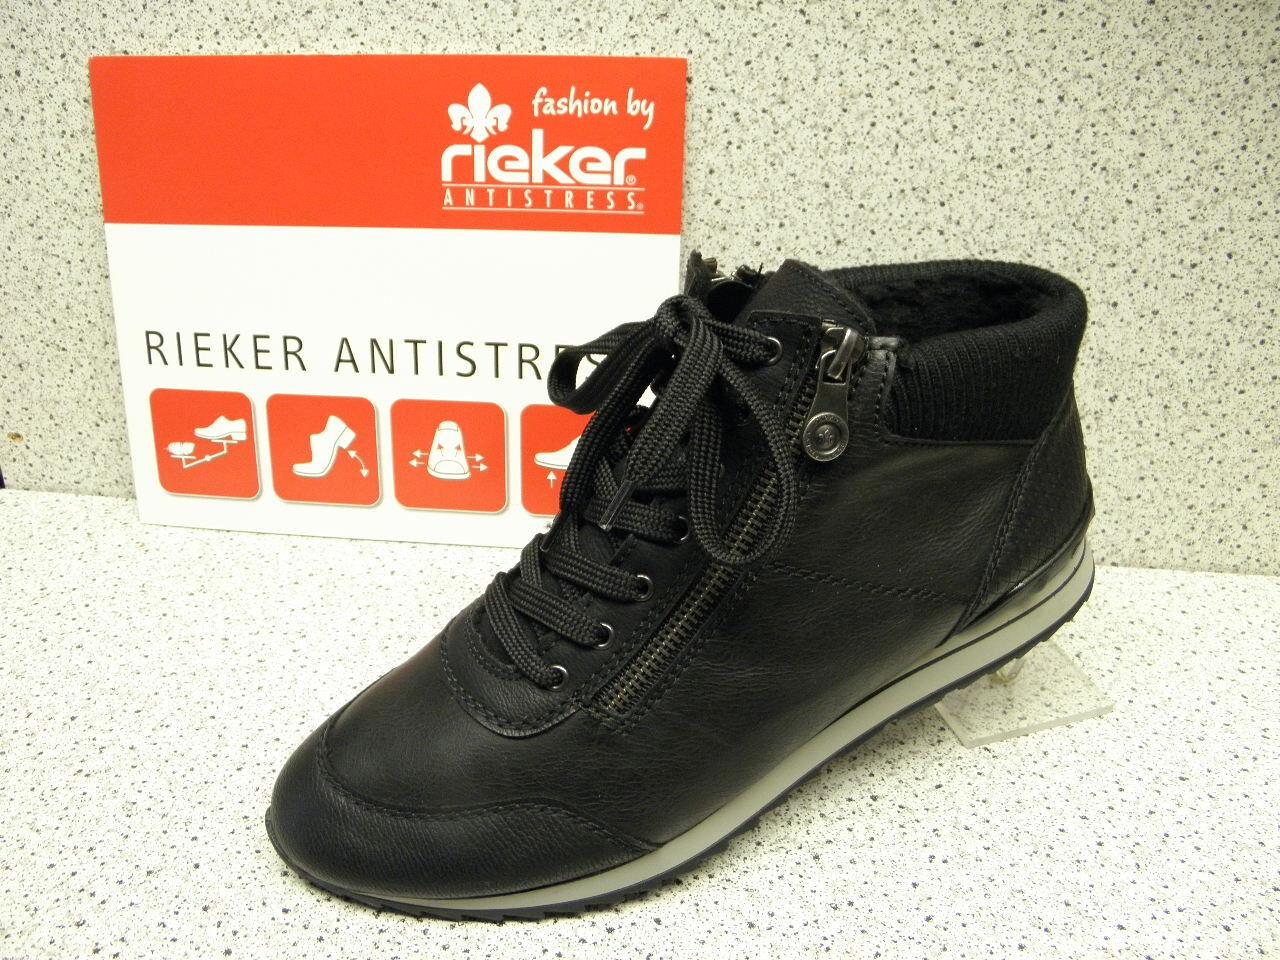 rieker ® SALE  bisher    + gratis Premium-Socken 56814-01(R163)